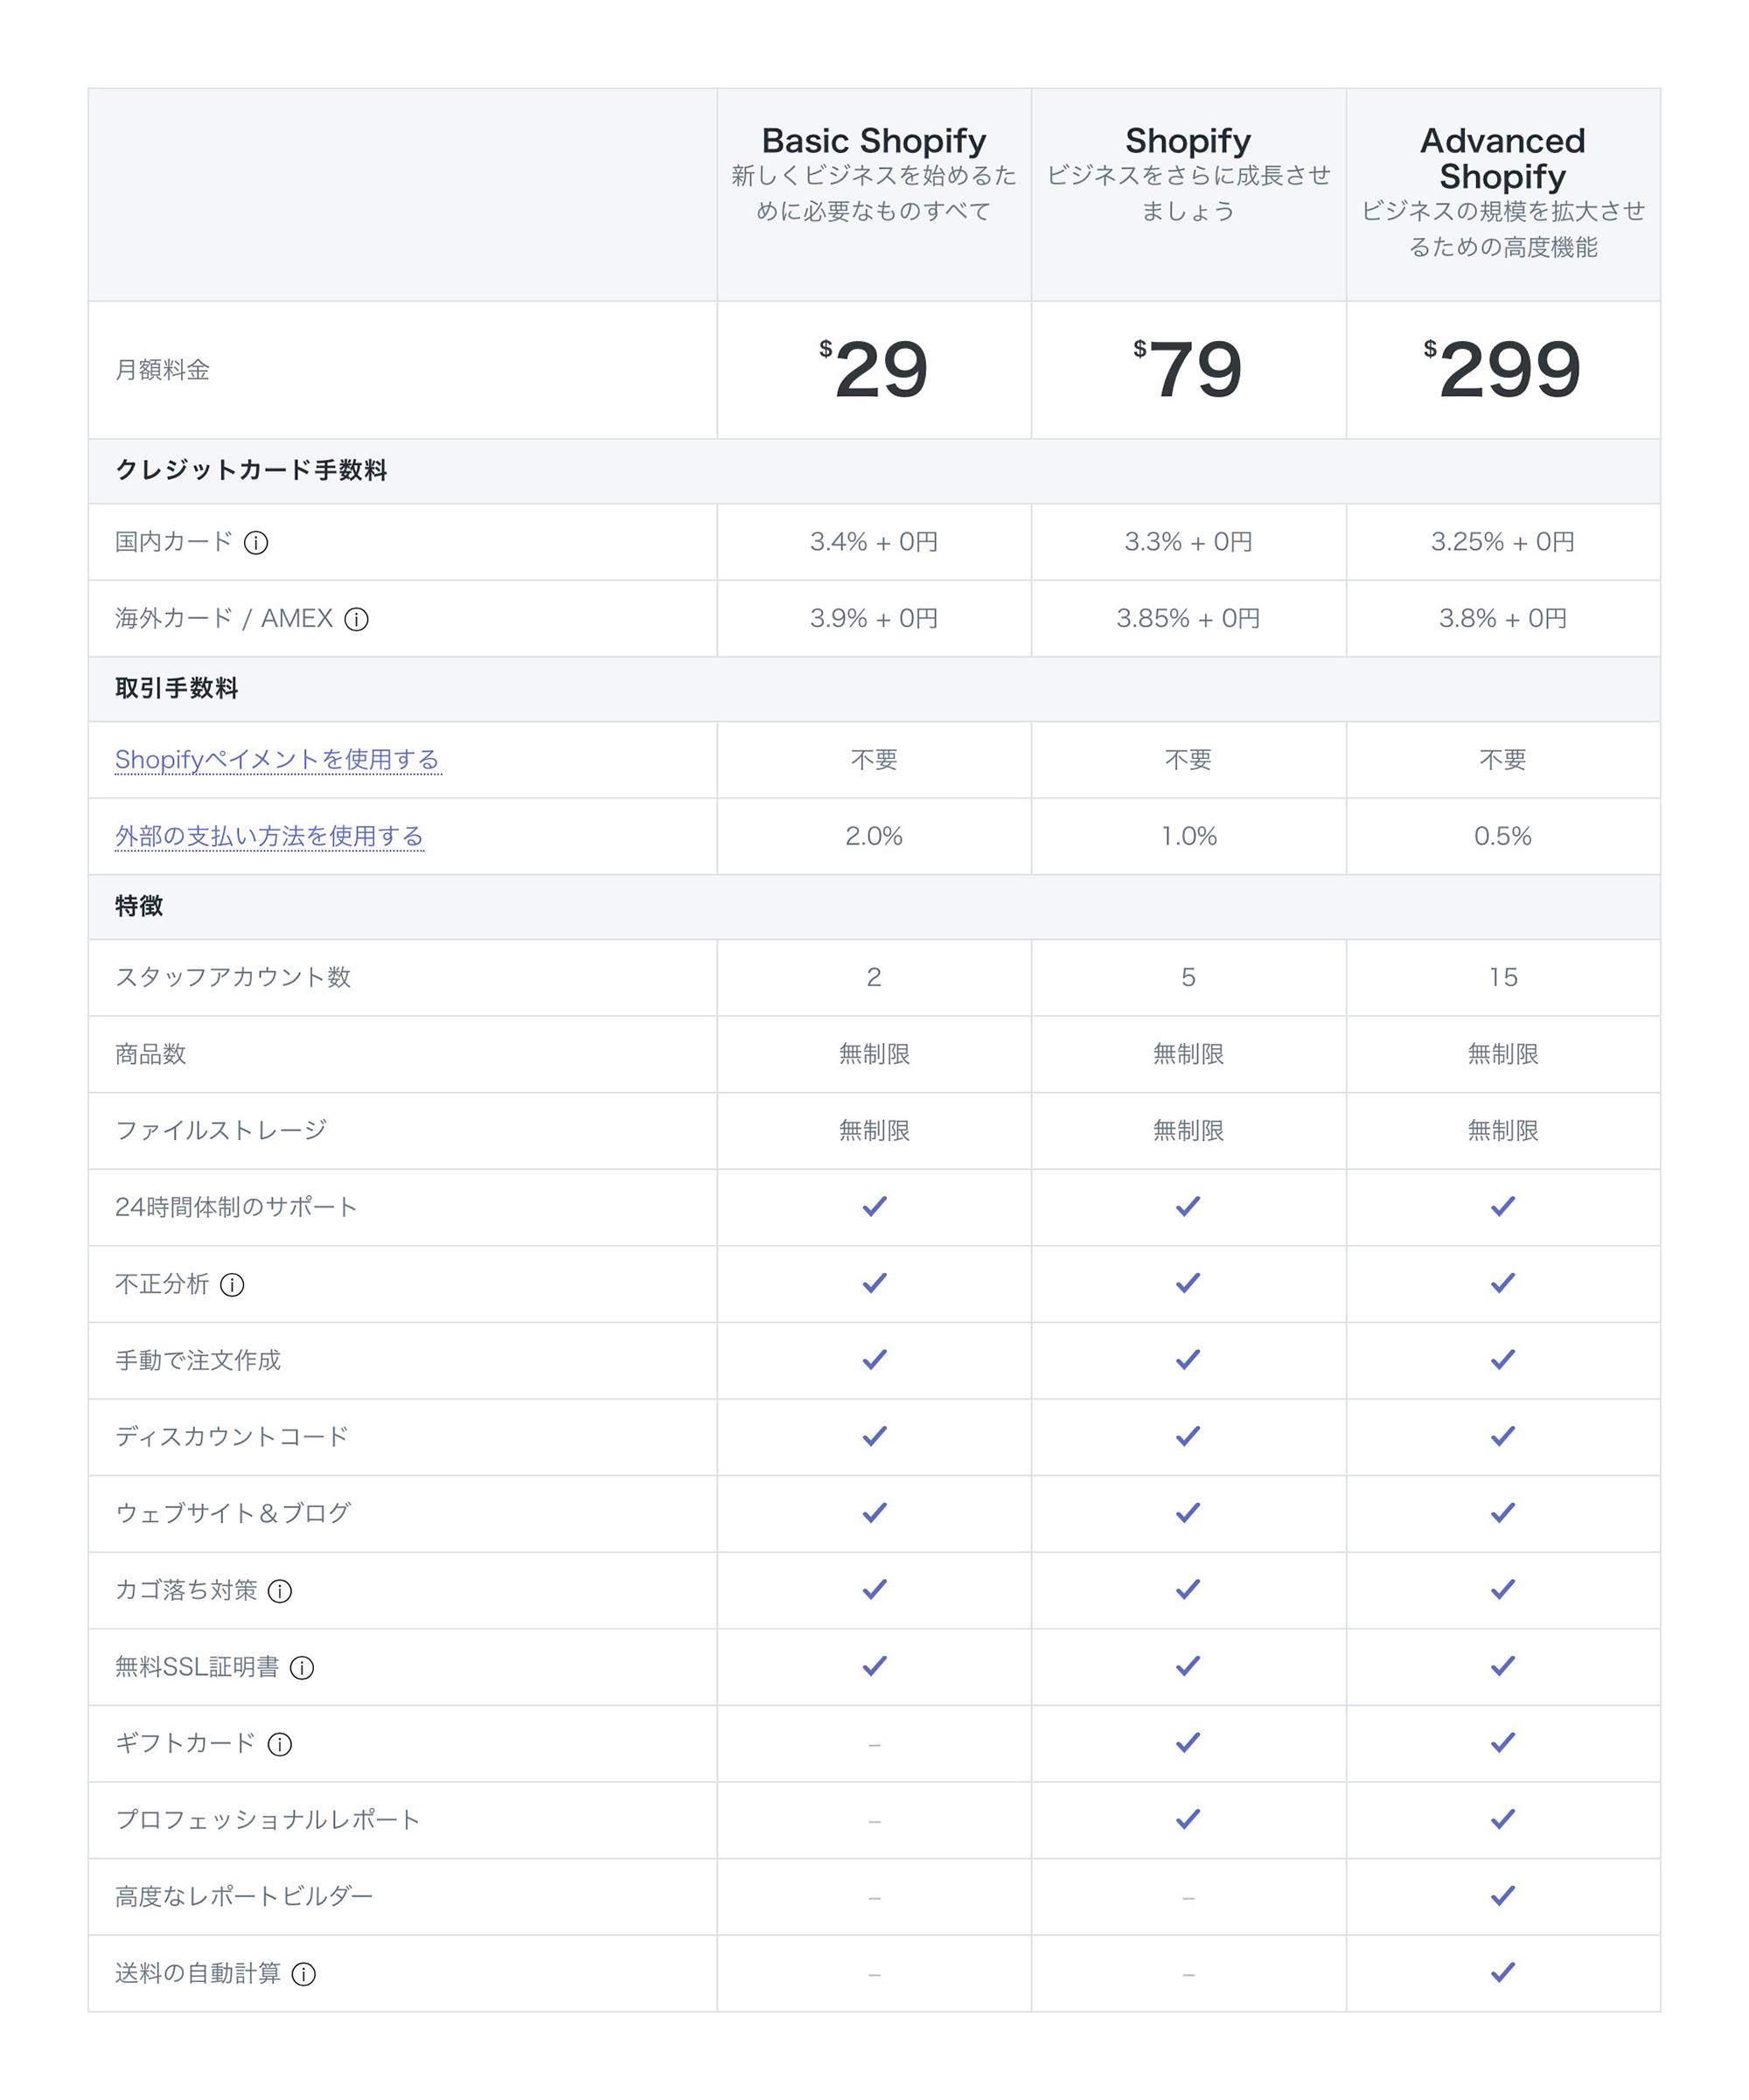 shopify_5.jpg